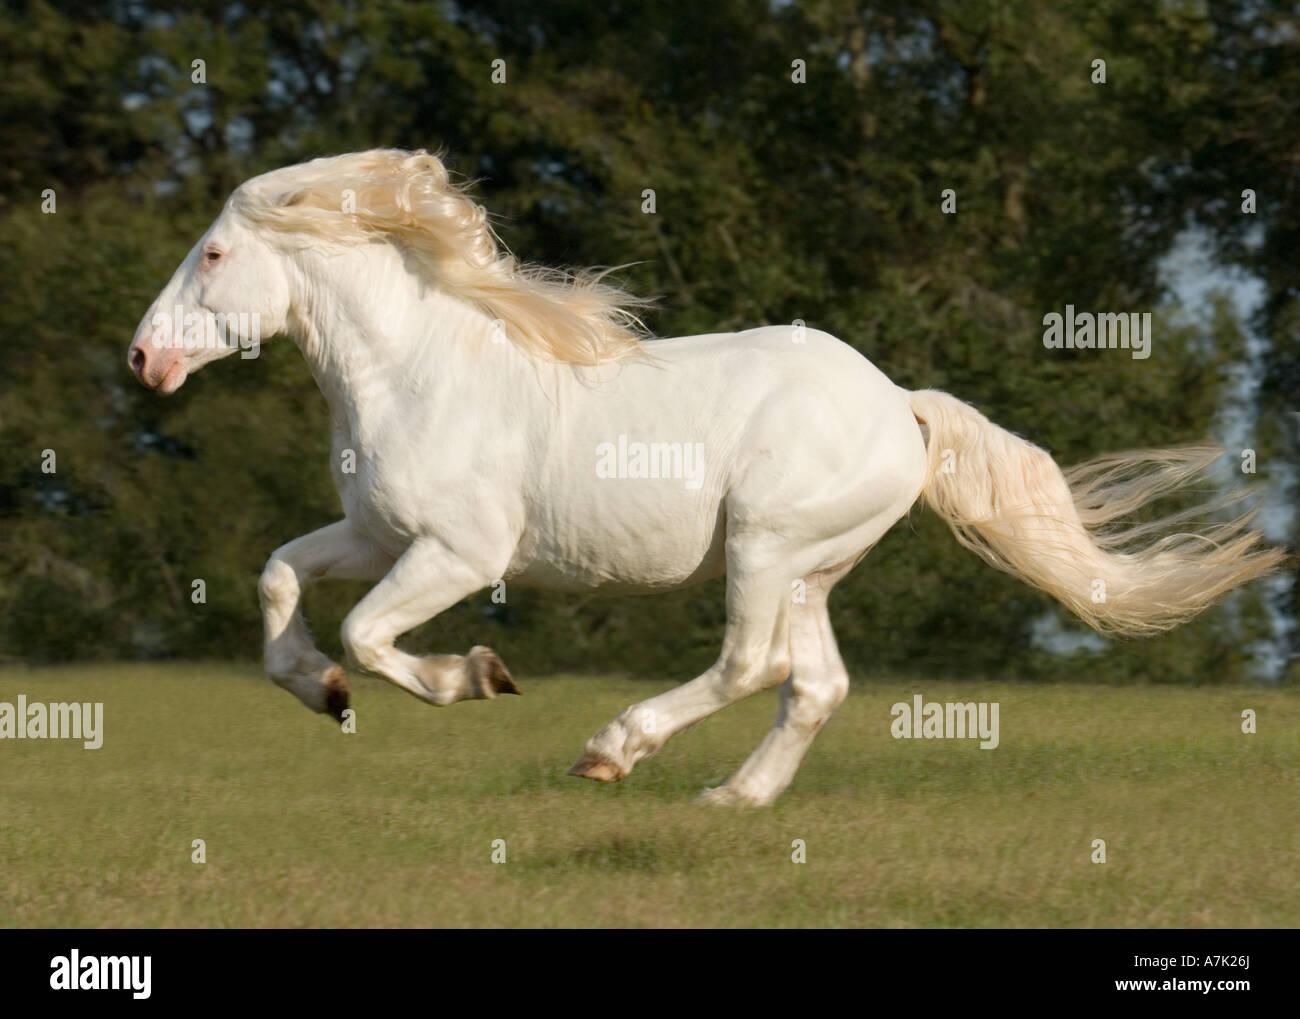 Four Year Old American White Draft Horse Stallion Stock Photo Alamy